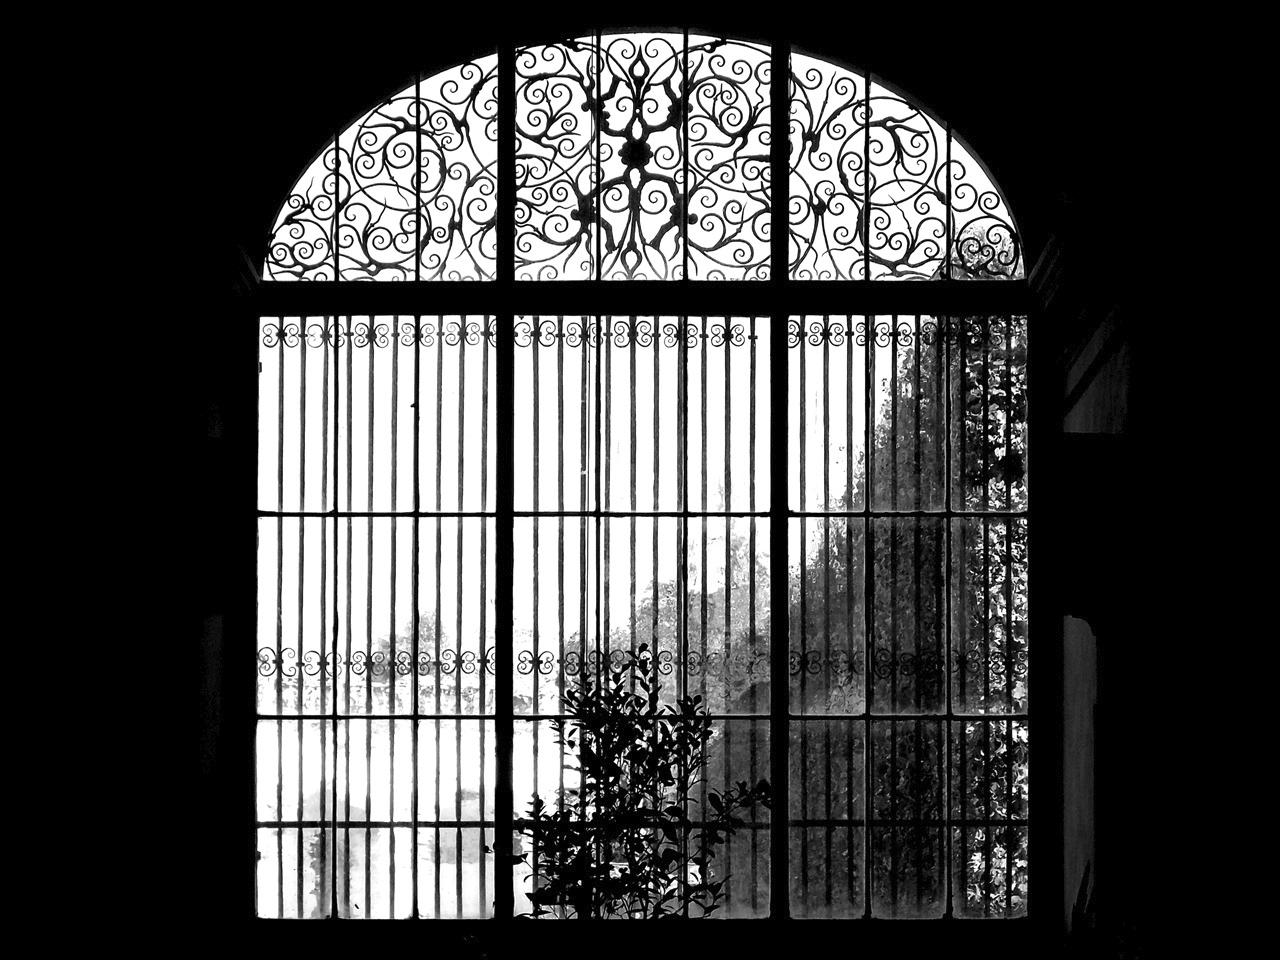 Ablak a kertre